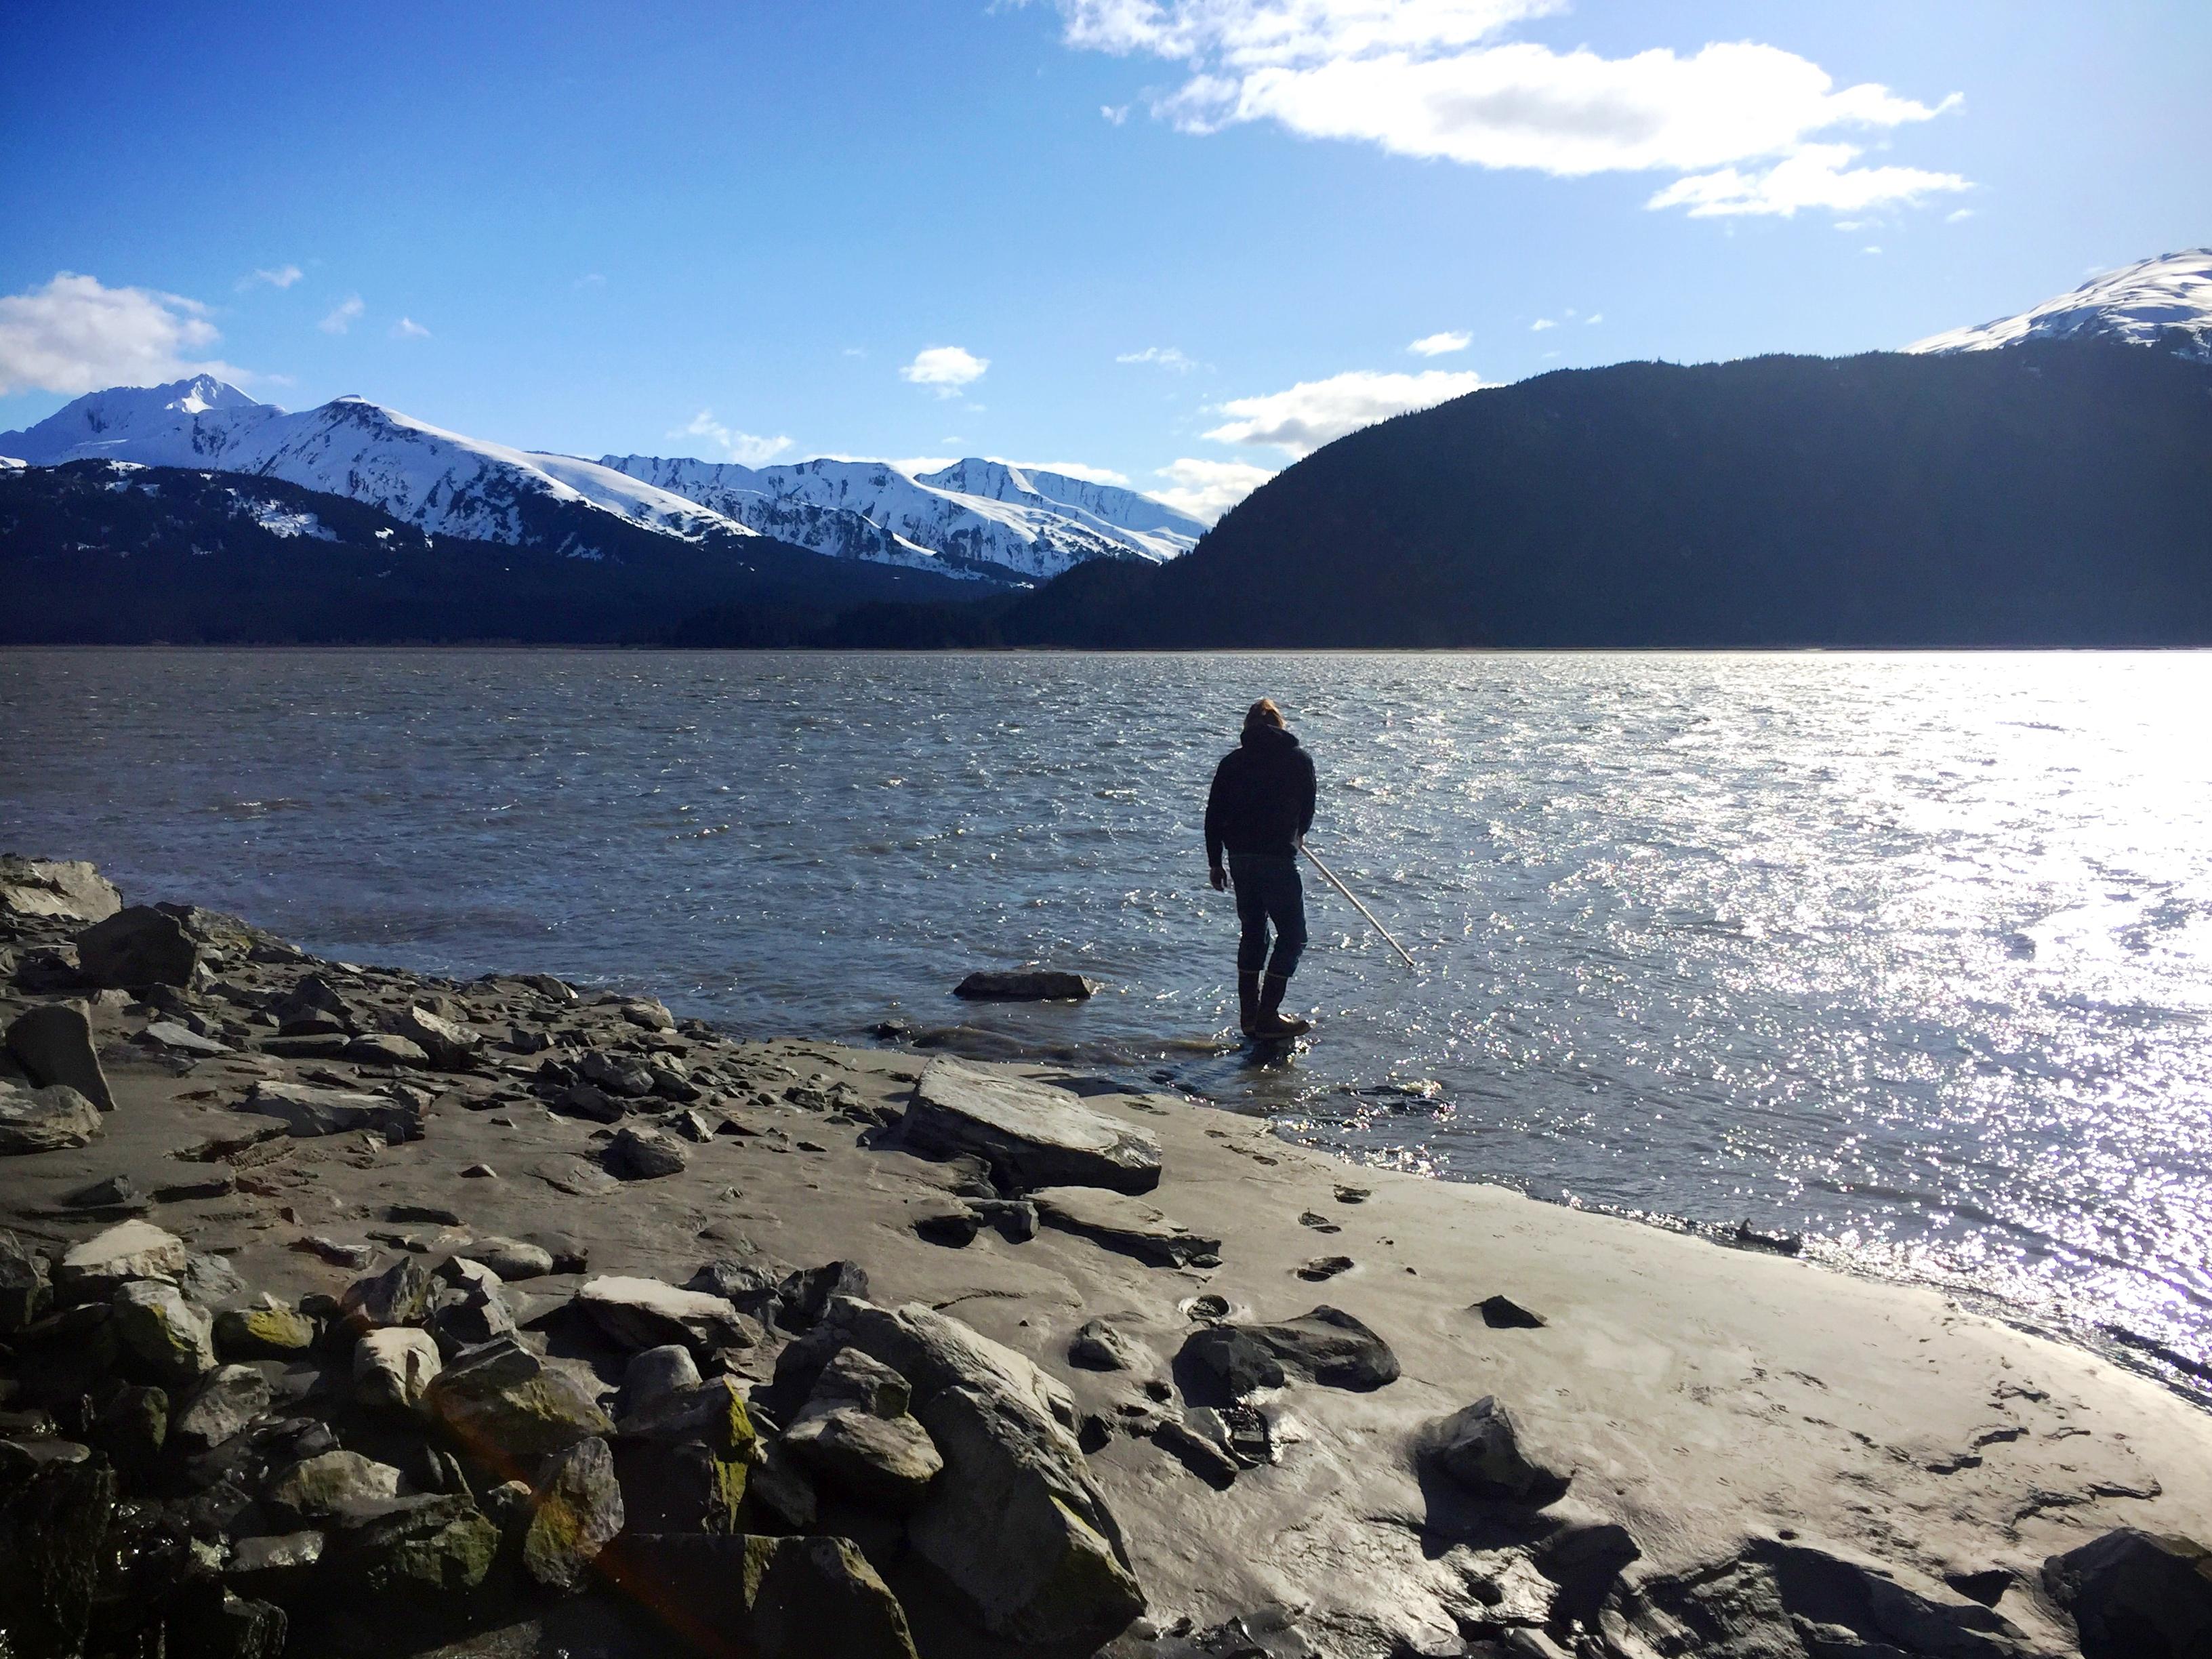 Harvesting Alaska: Smoked Hooligan